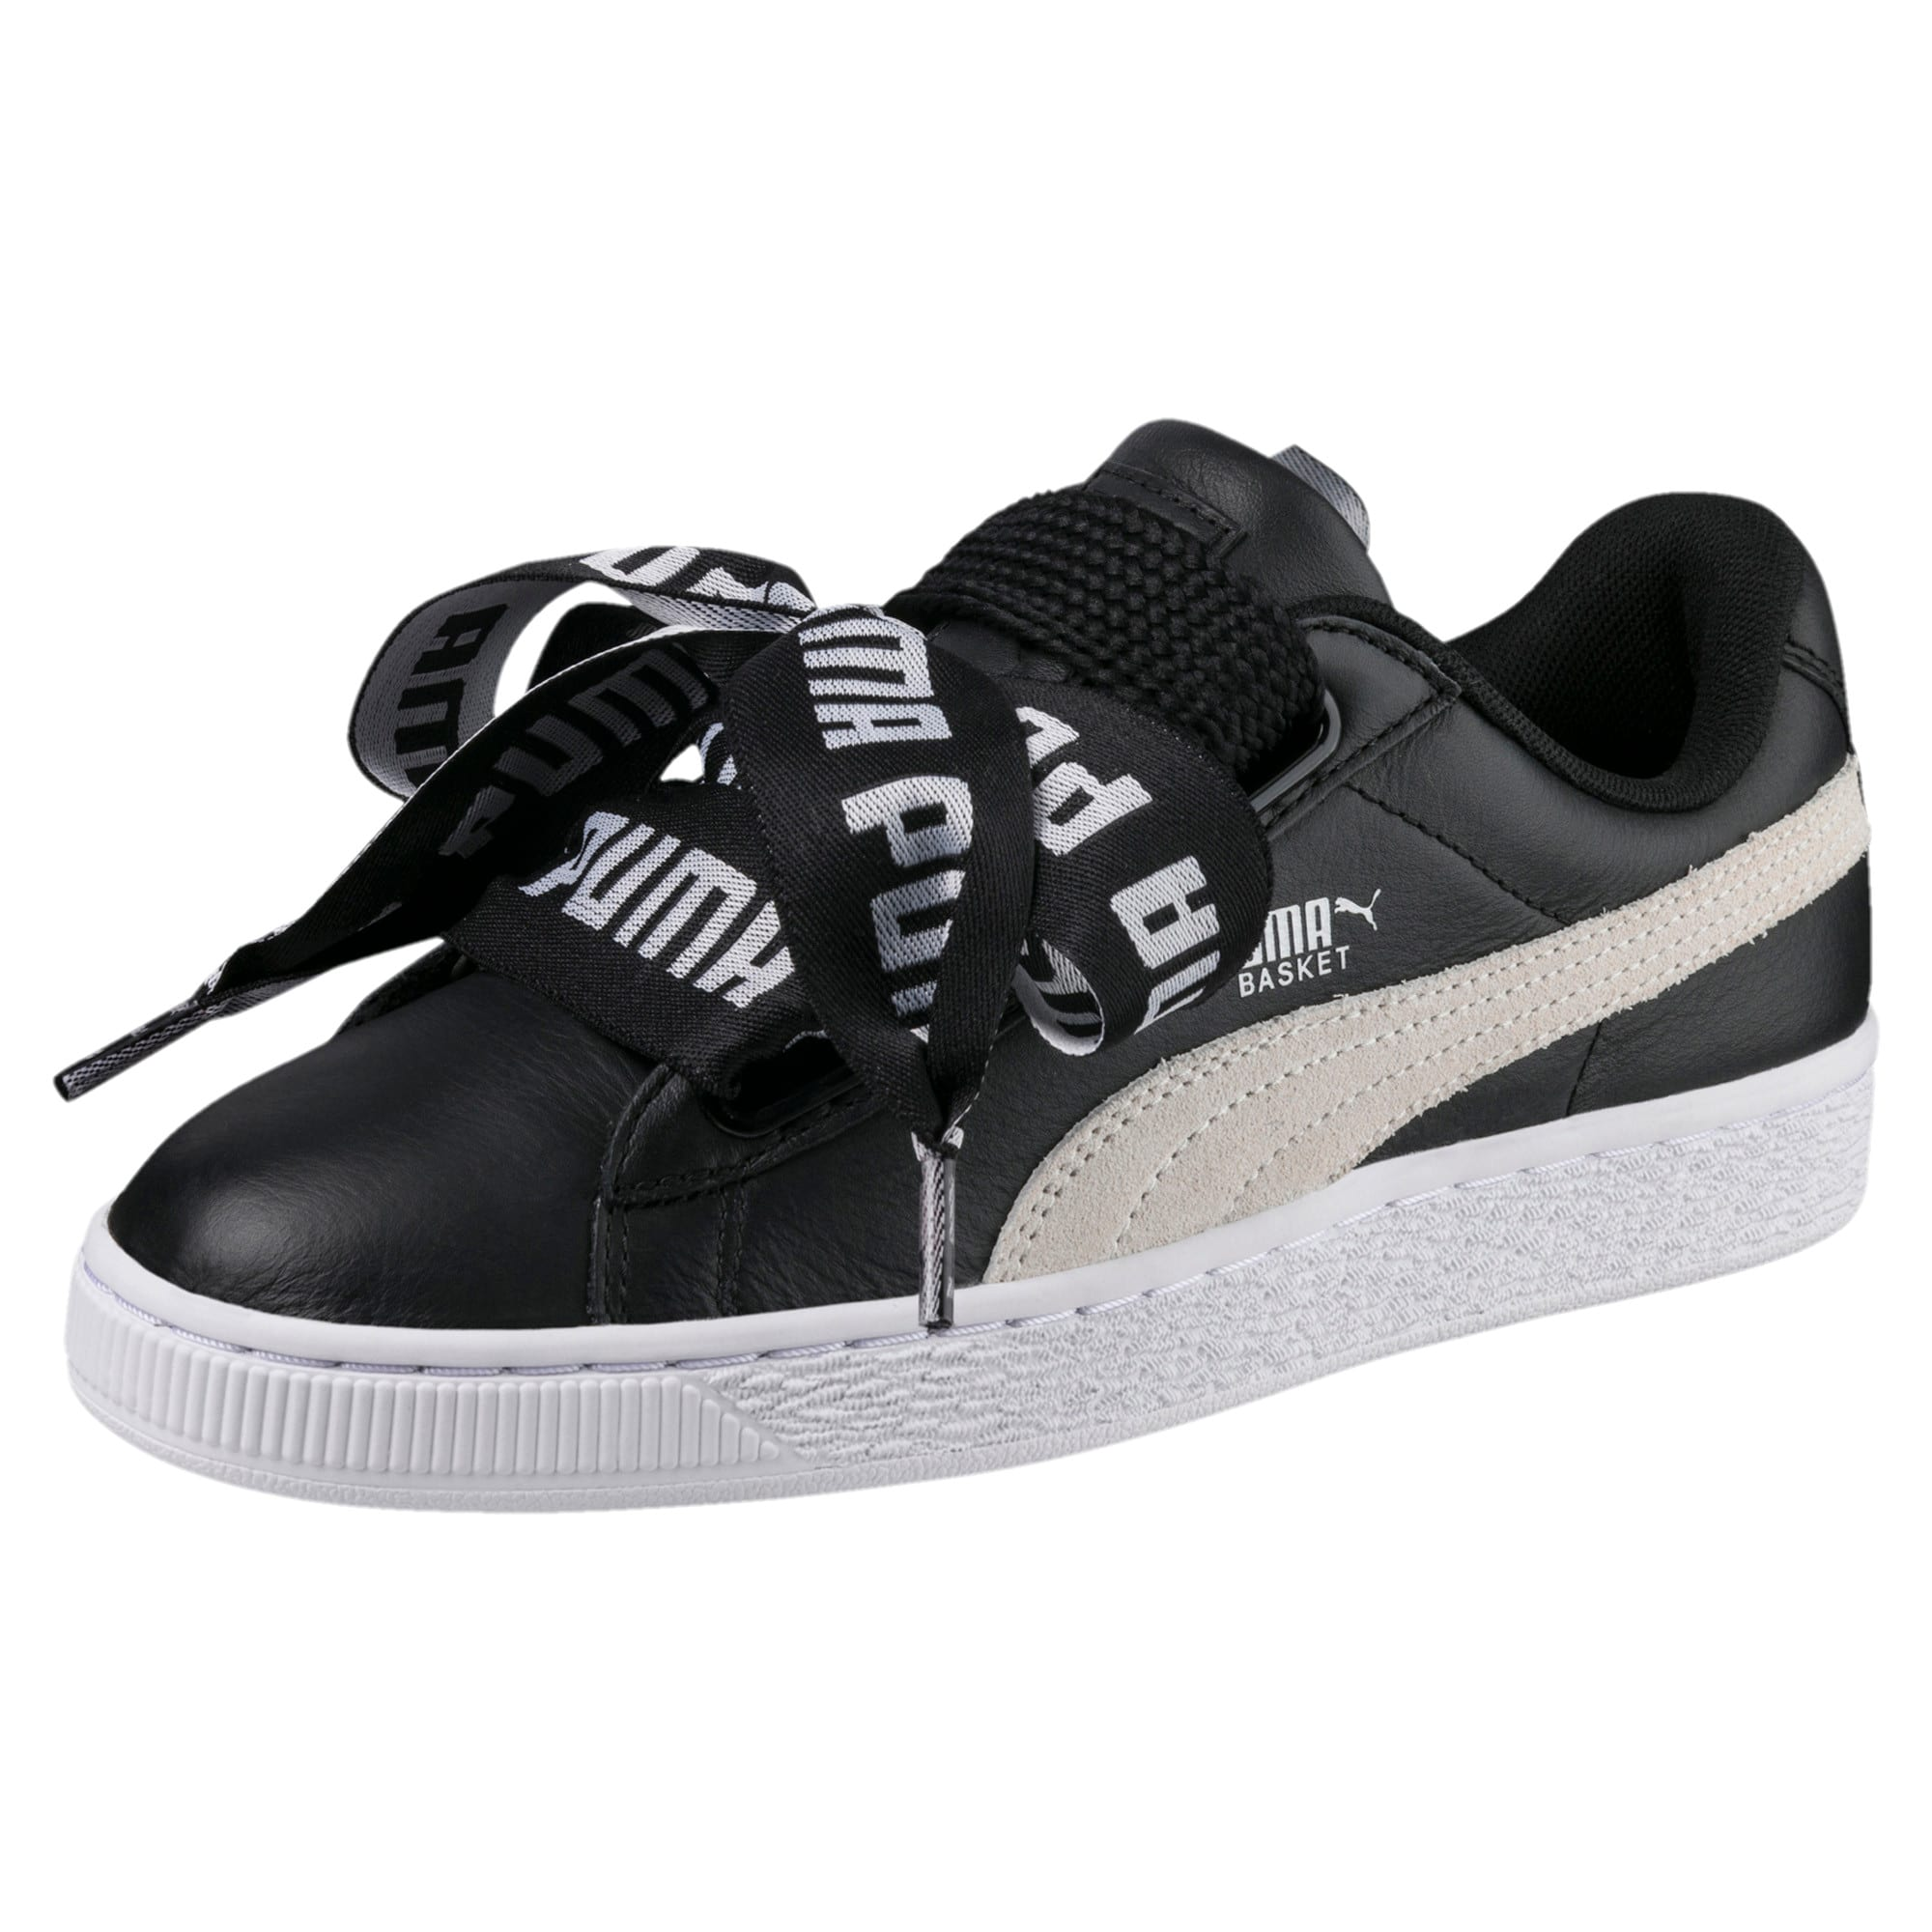 Thumbnail 1 of Basket Heart DE Women's Sneakers, Puma Black-Puma White, medium